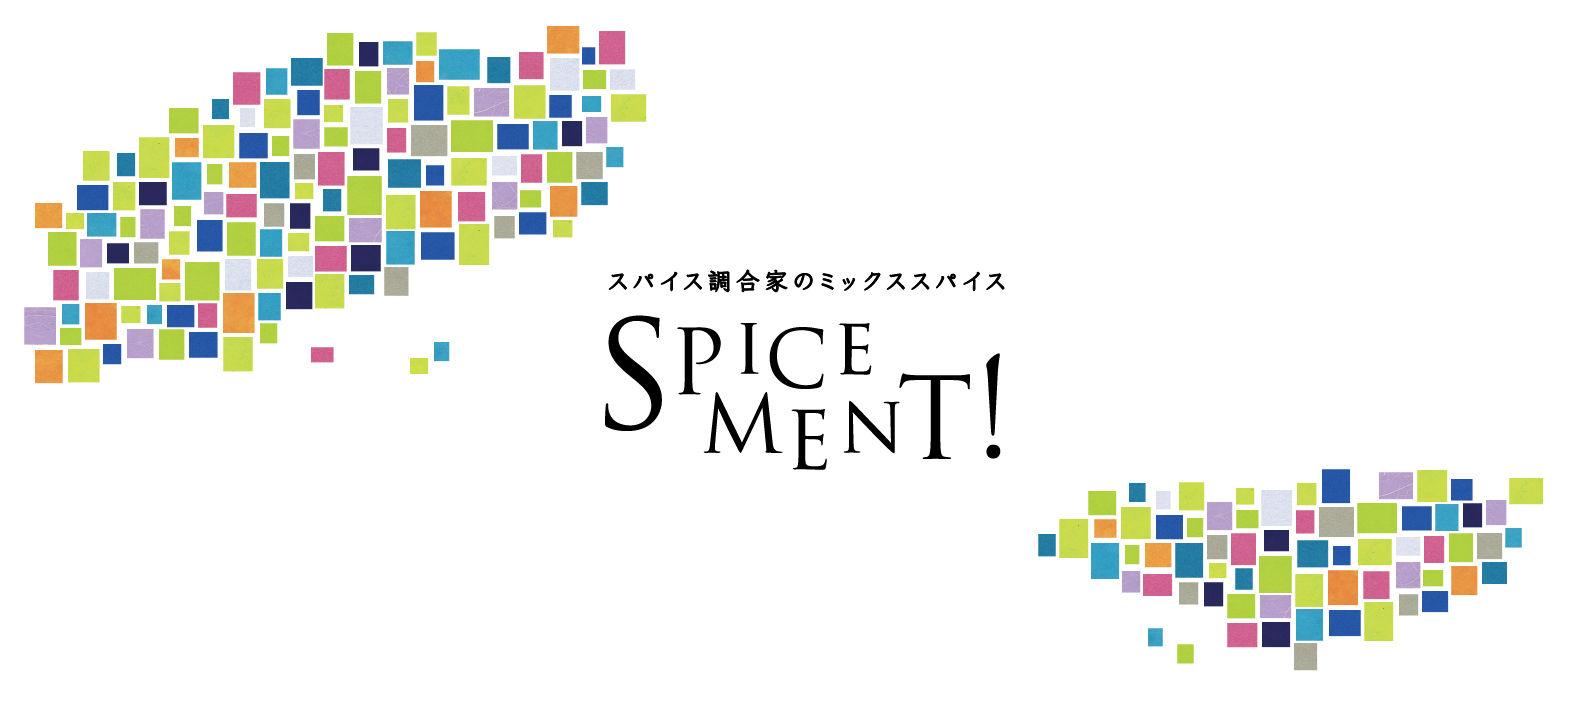 SPICEMENT!〜スパイス調合家のミックススパイス